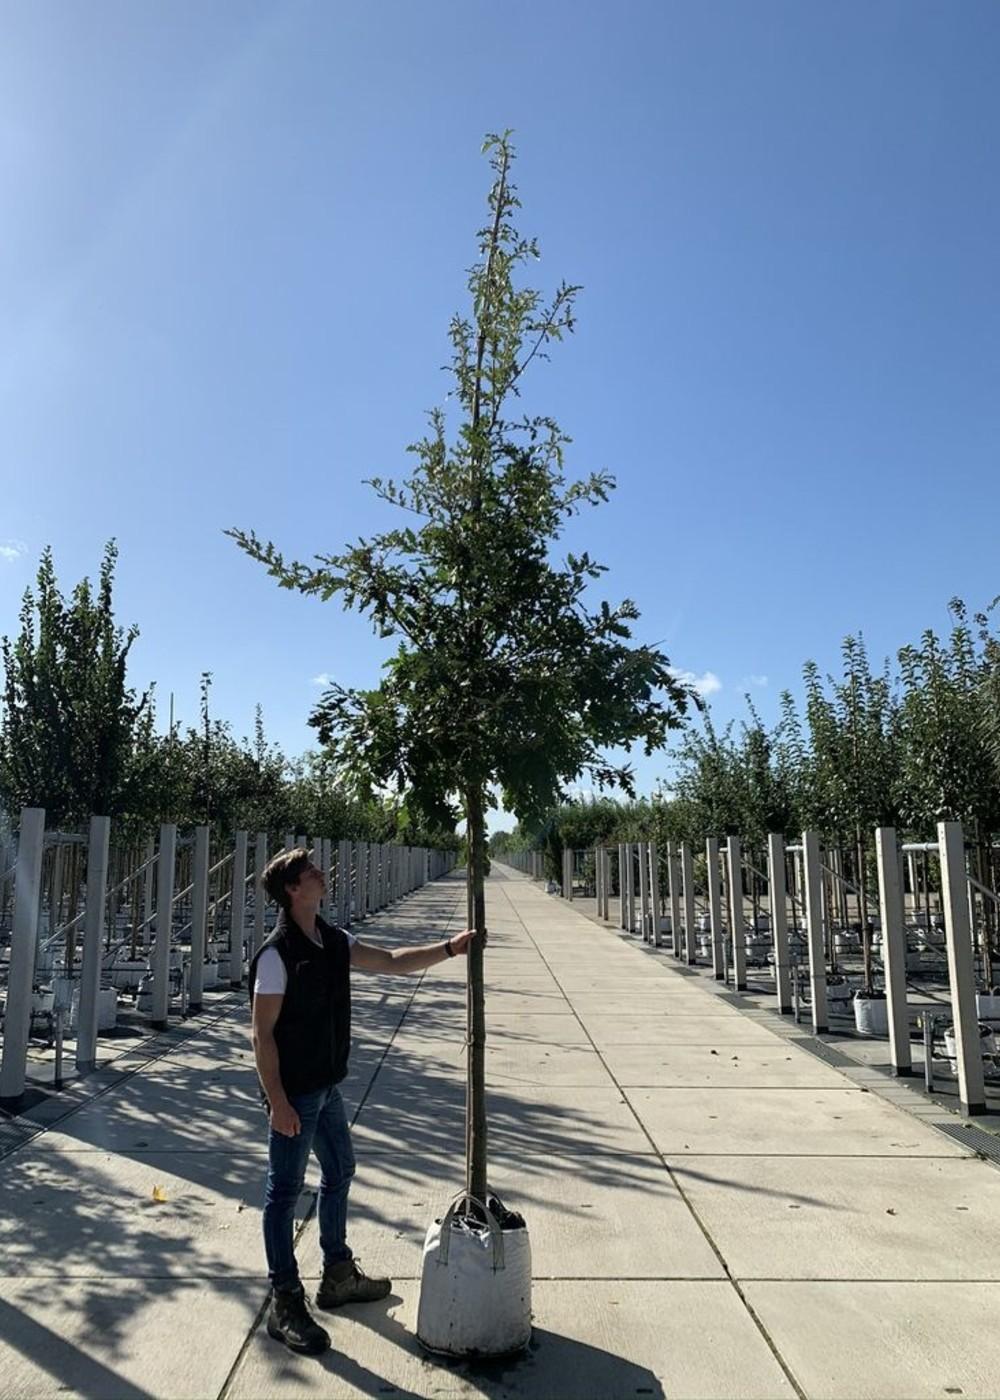 Zerr-Eiche | Quercus cerris